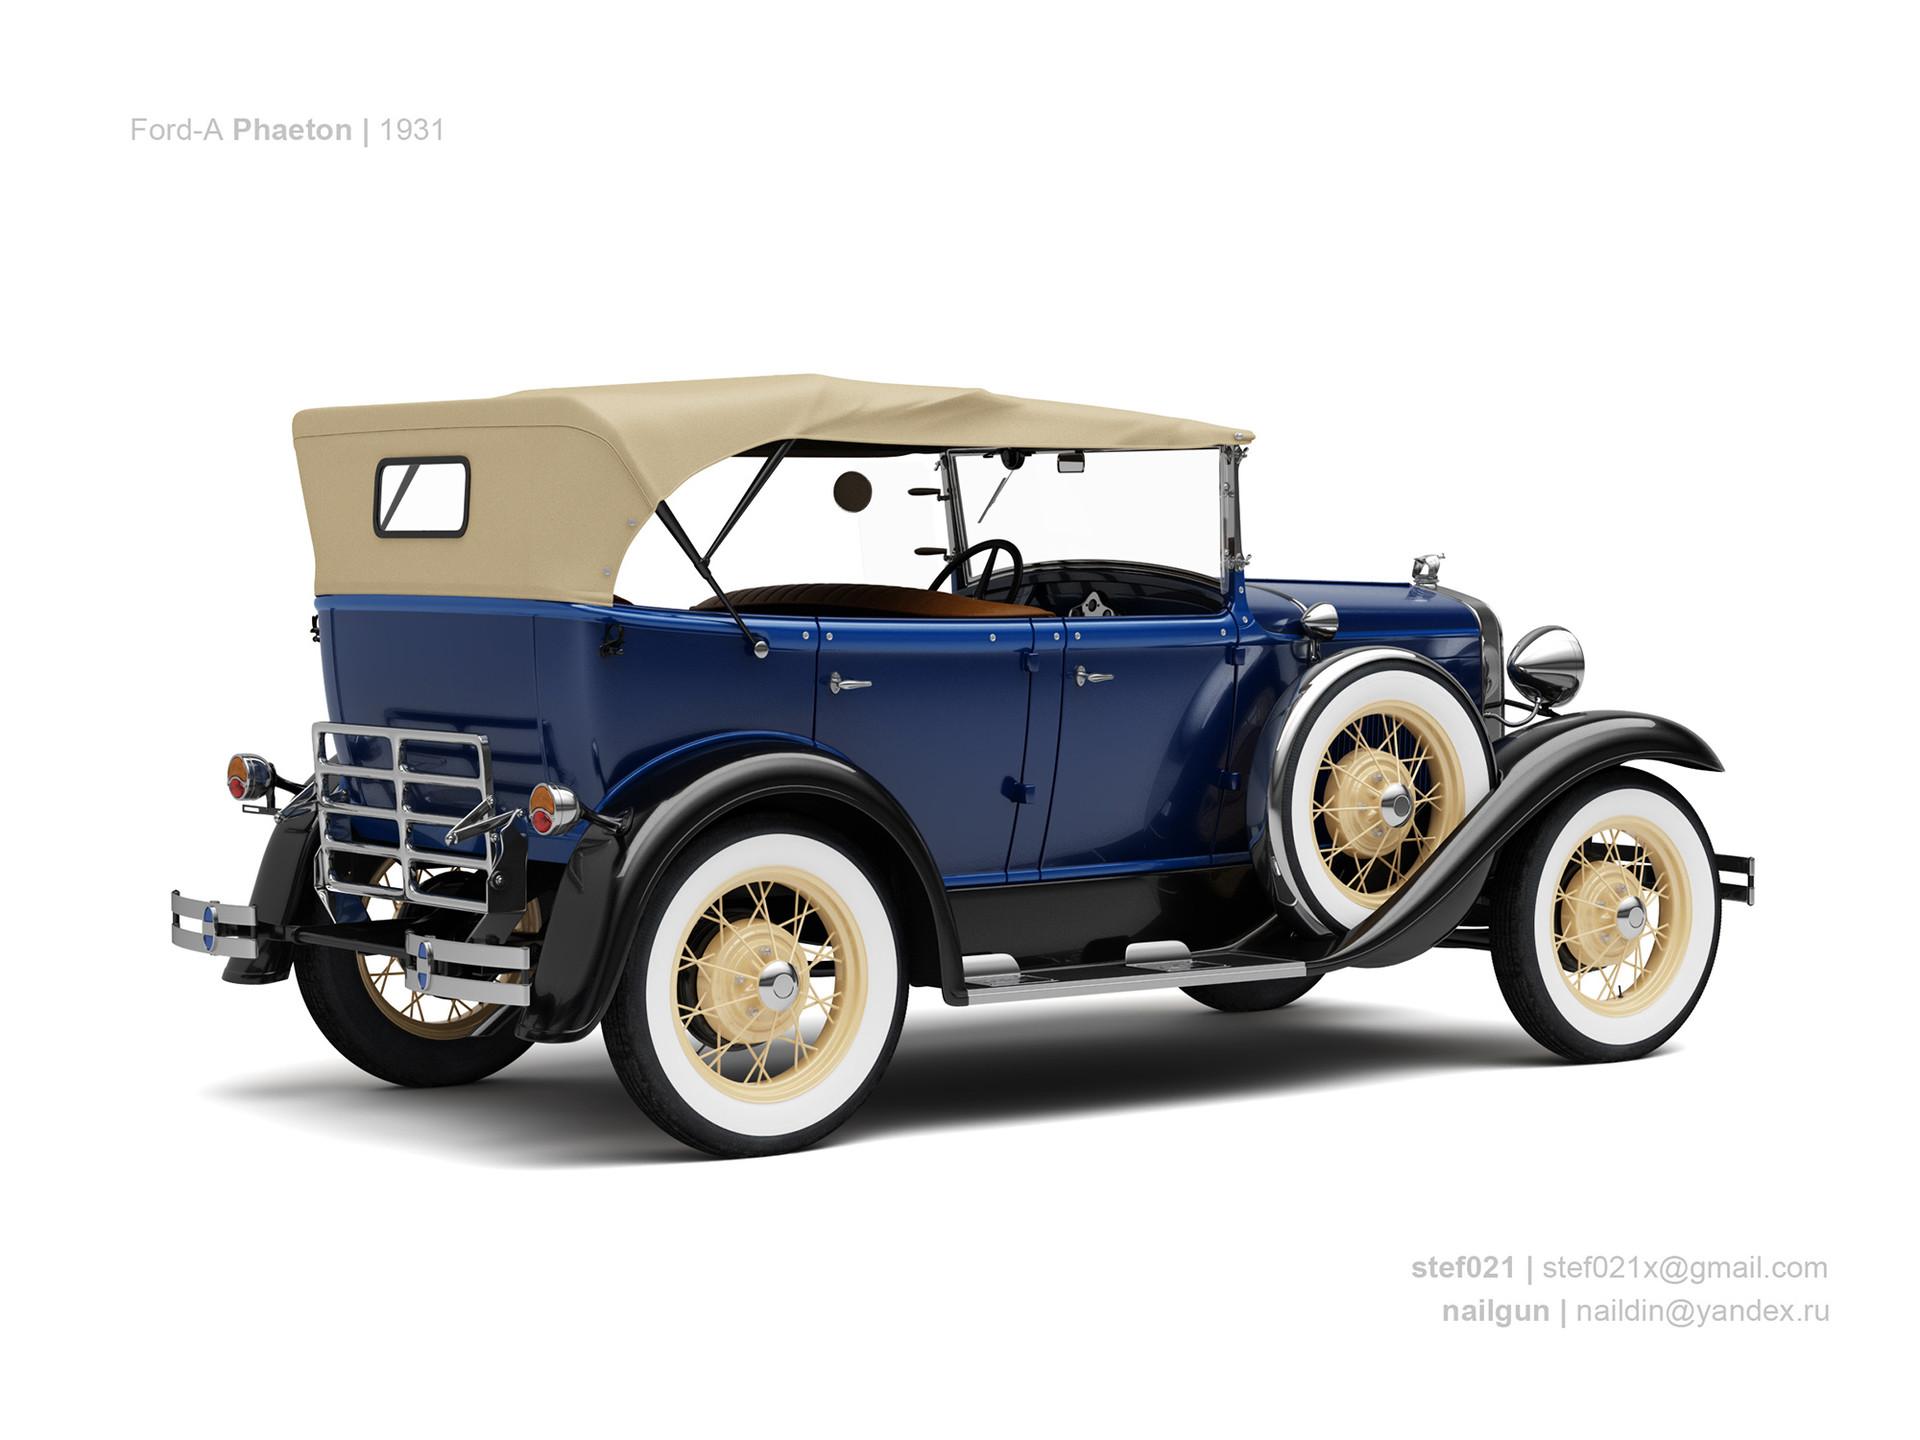 Nail khusnutdinov usa ford a phaeton 1931 1